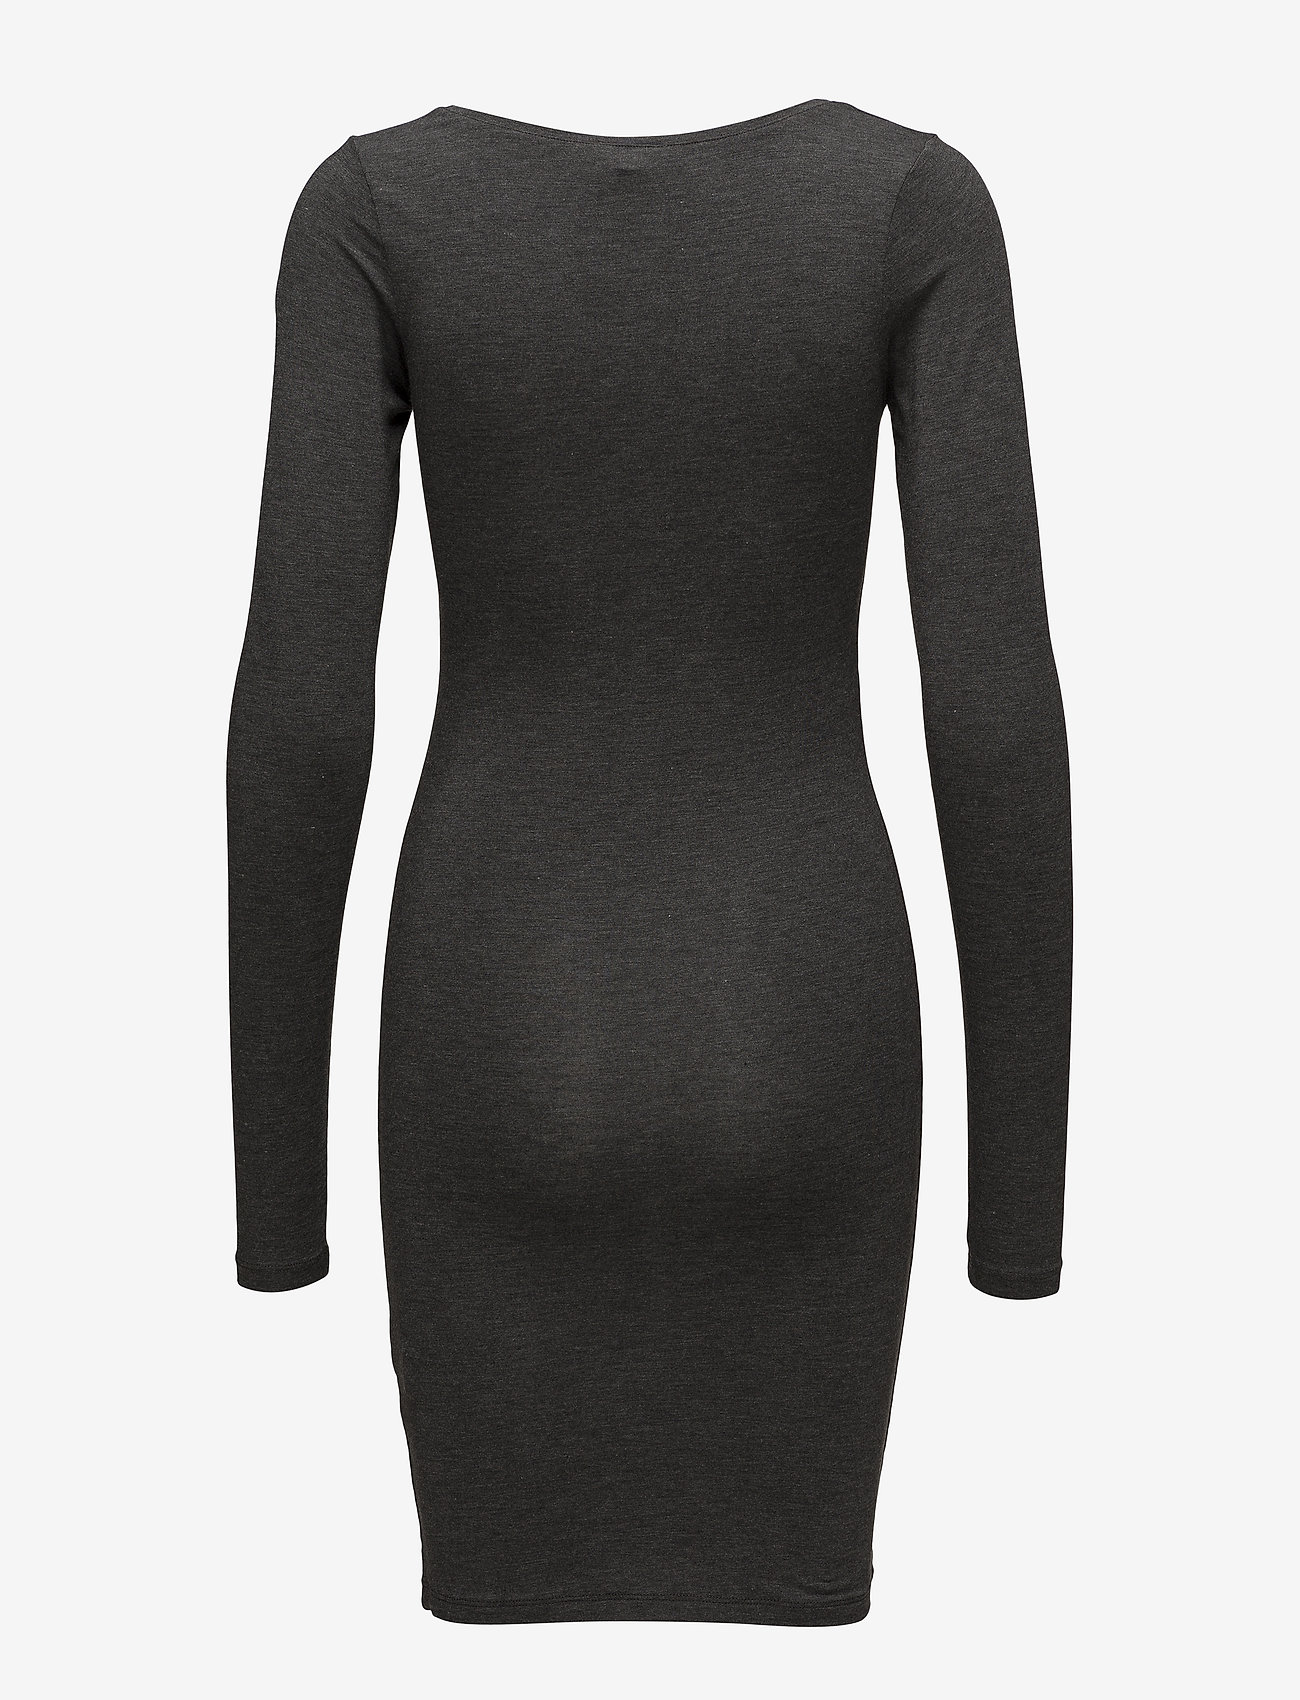 mbyM - Hanna - midi dresses - dark grey melange - 1